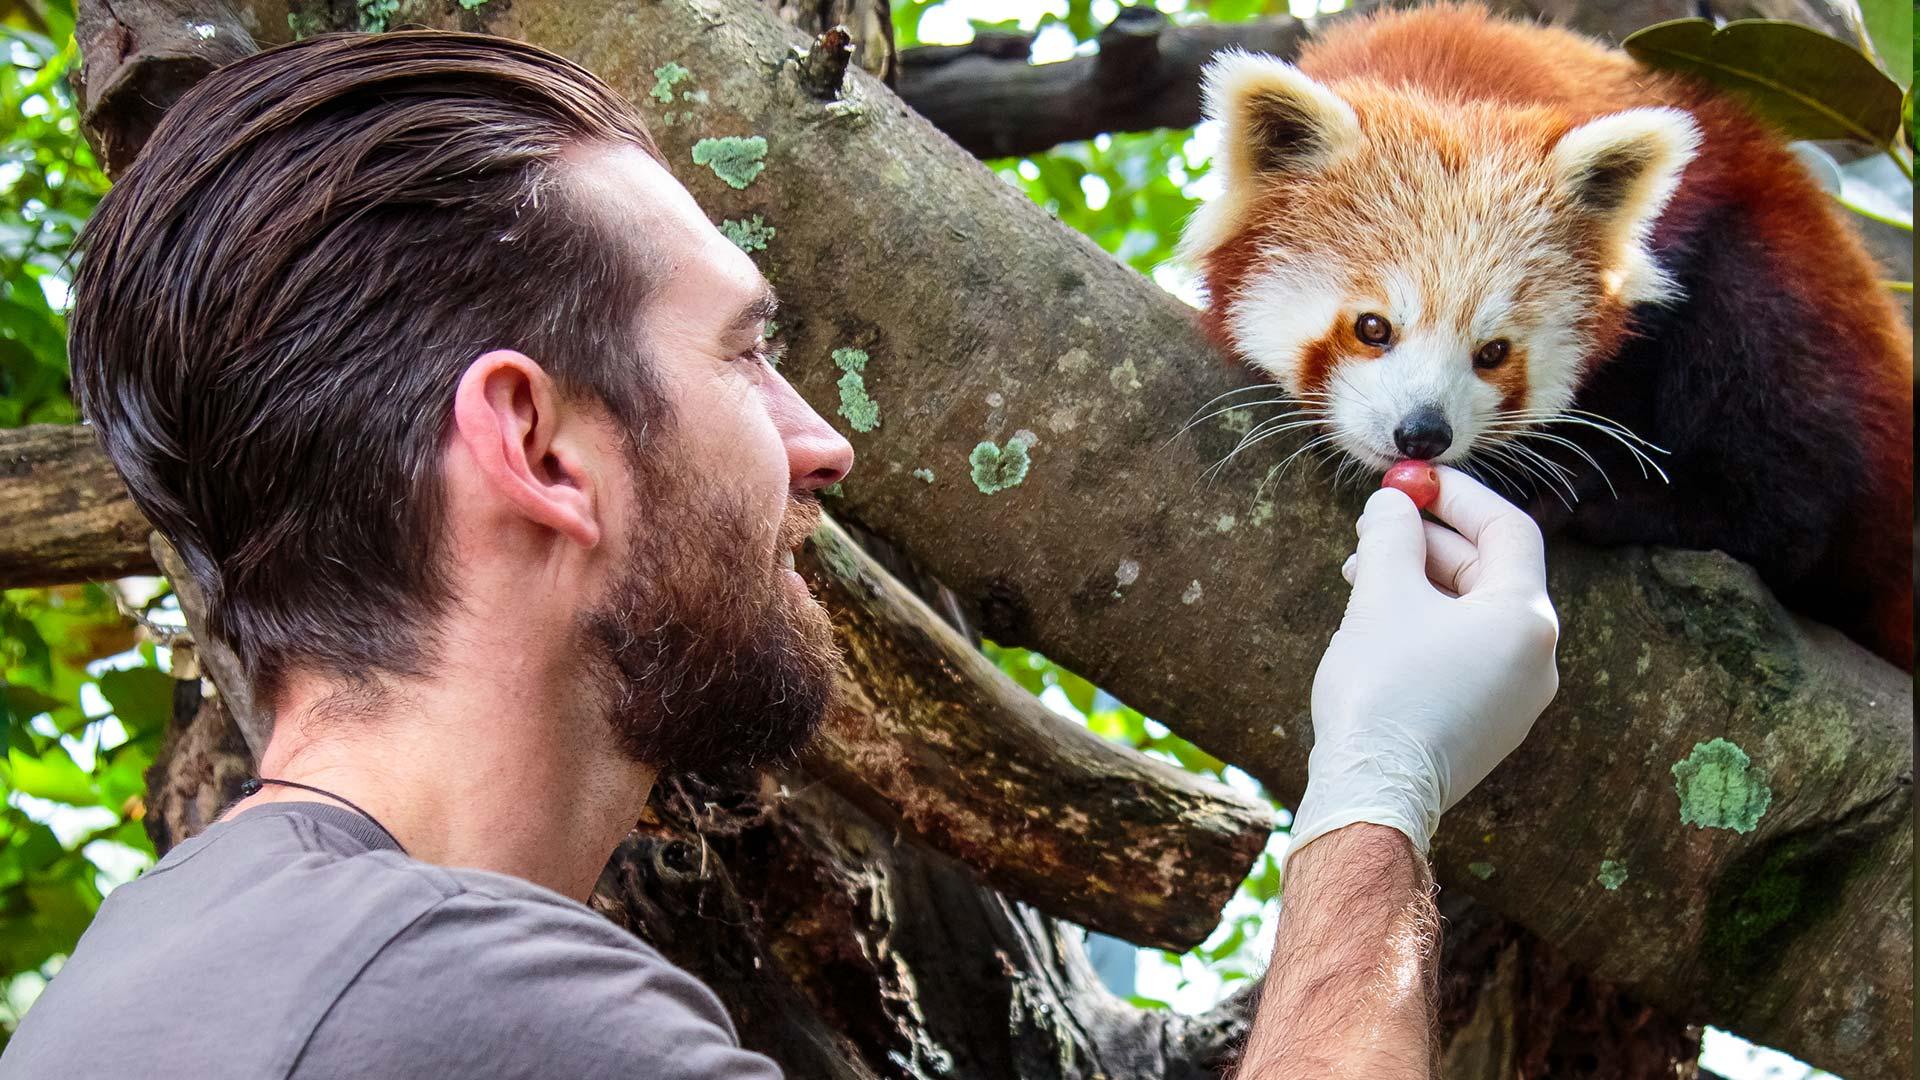 https://rfacdn.nz/zoo/assets/media/red-panda-gallery.jpg